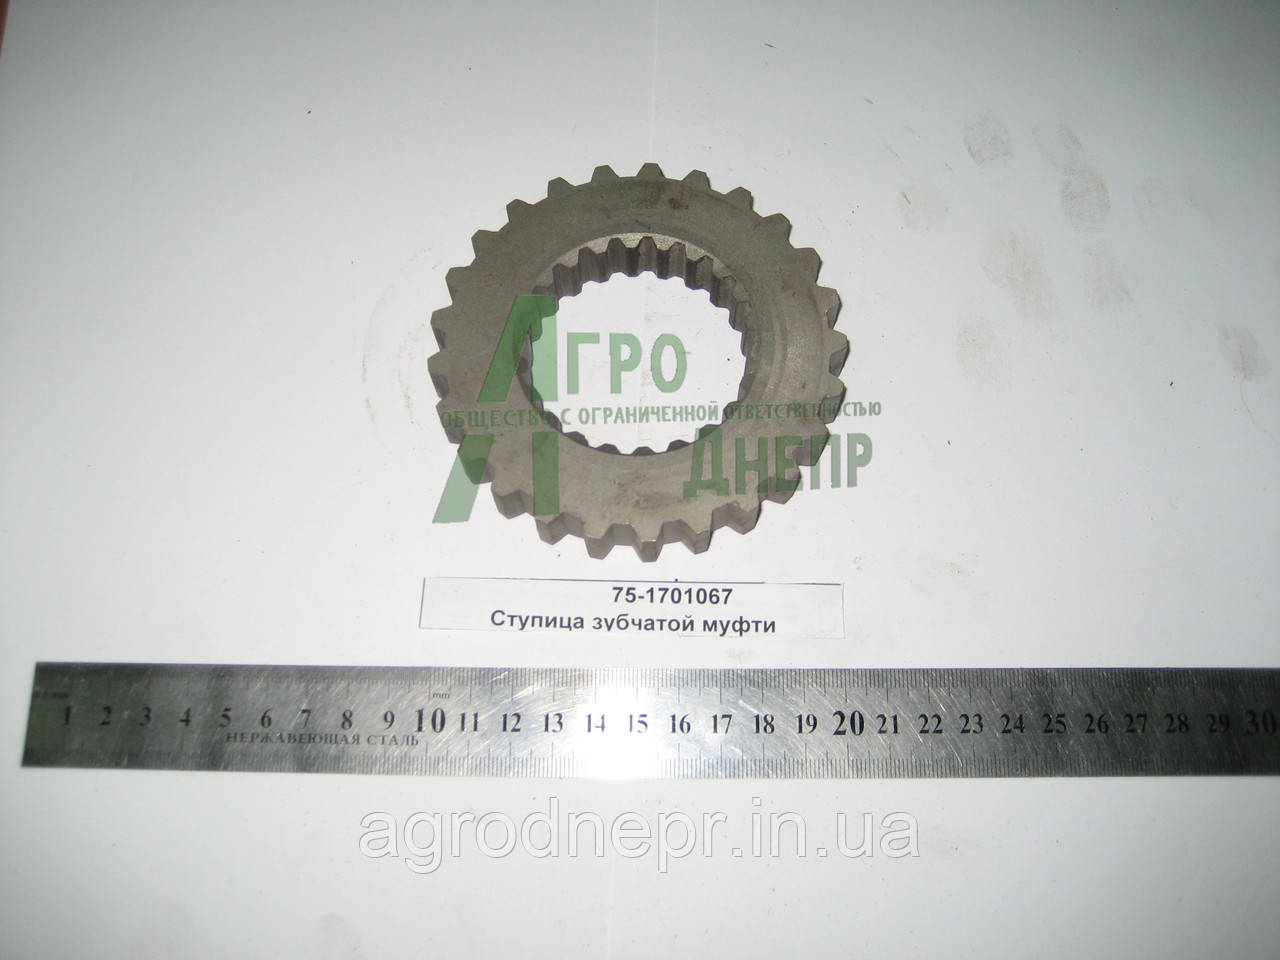 Ступица зубчатой муфты КПП ЮМЗ 8040 75-1701067